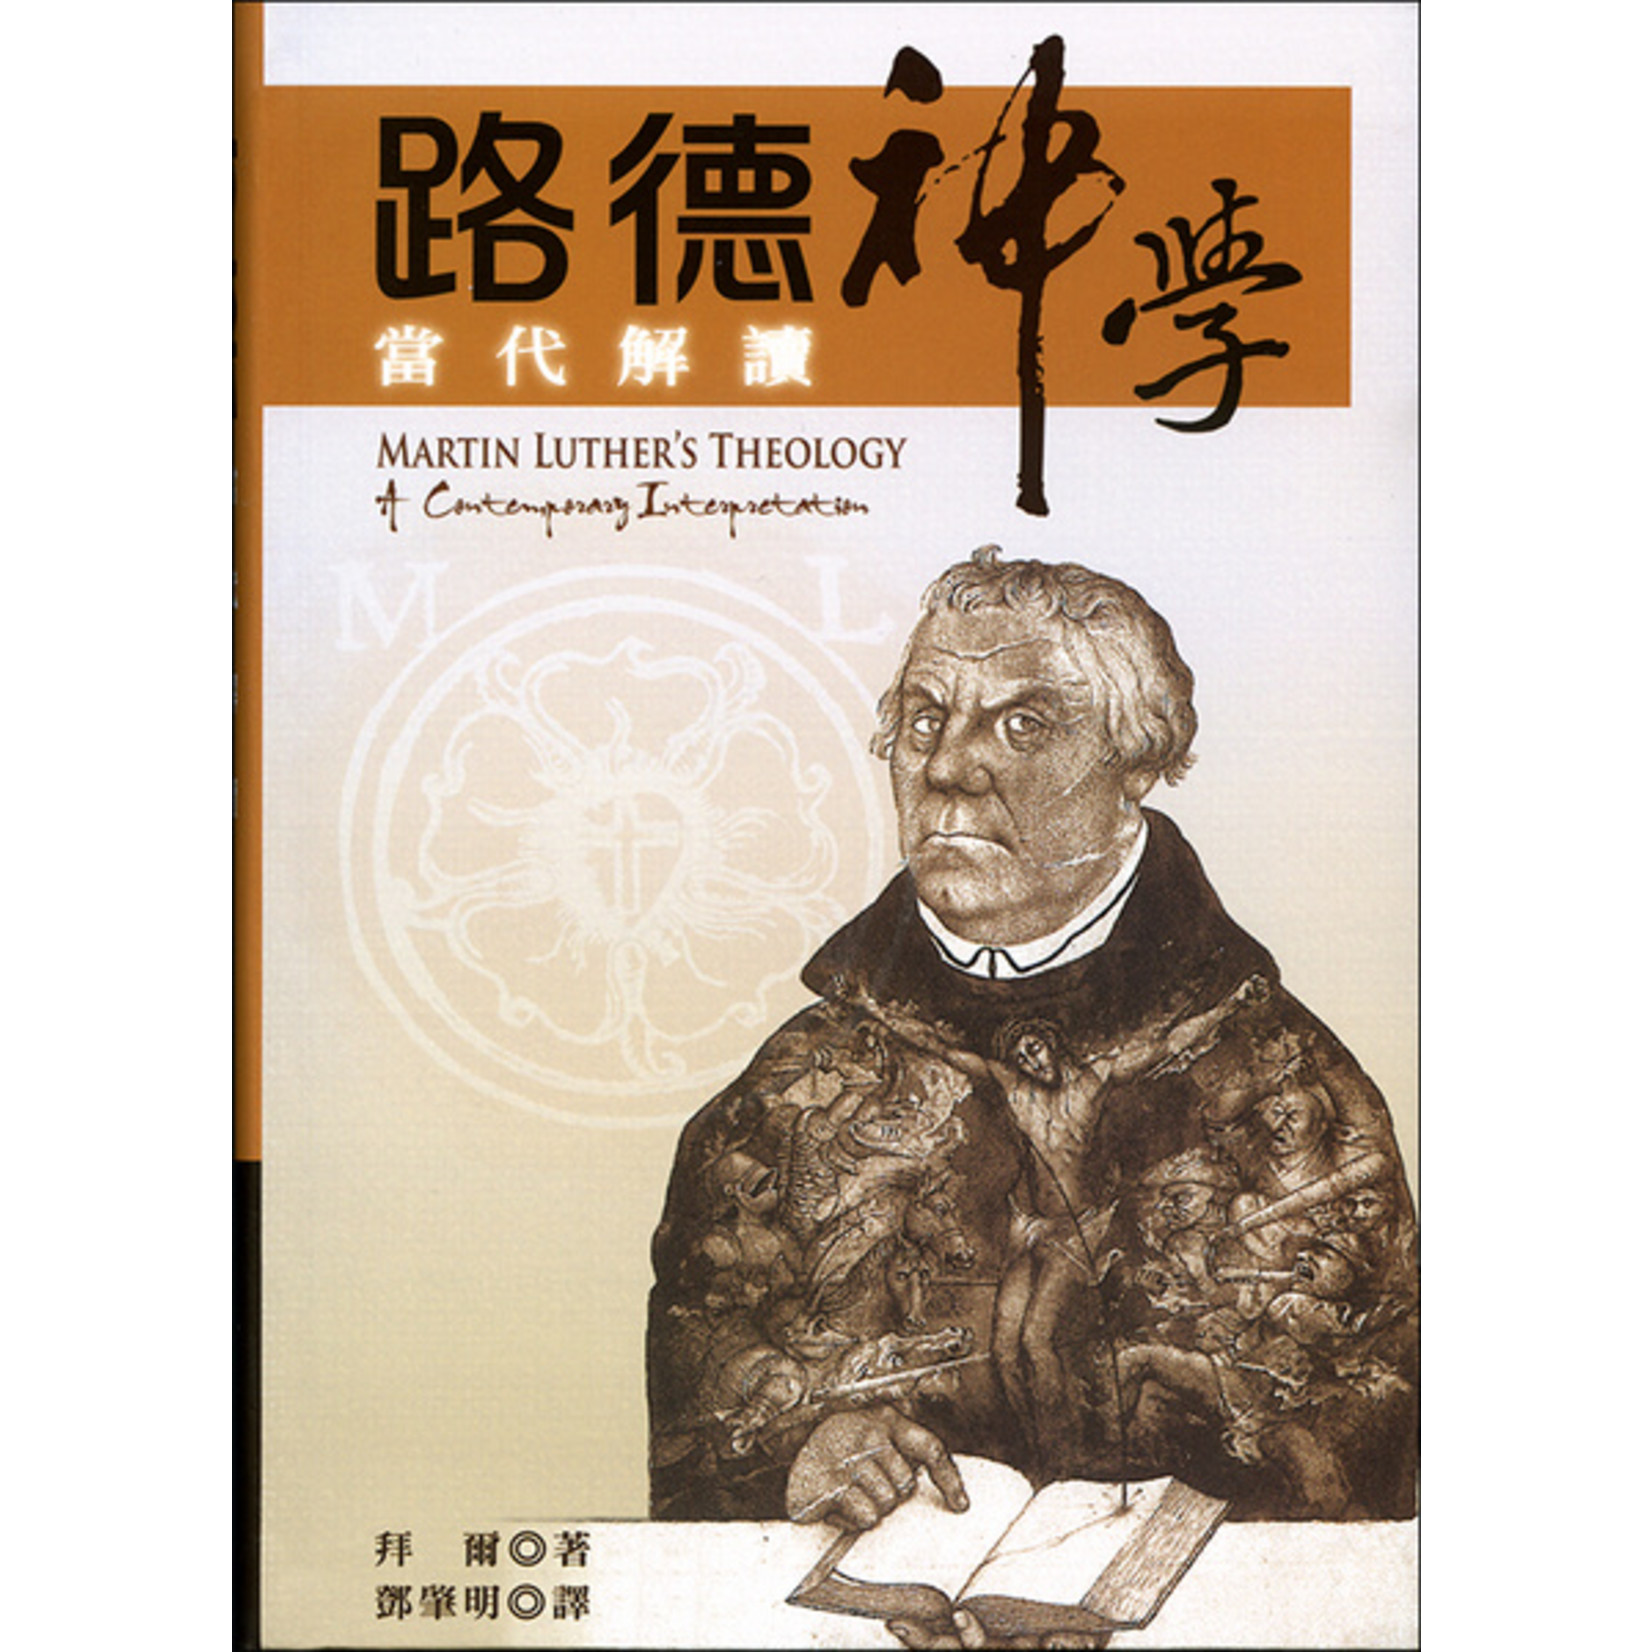 道聲(香港) Taosheng Hong Kong 路德神學:當代解讀 Martin Luther's Theology: a Contemporary Interpretation